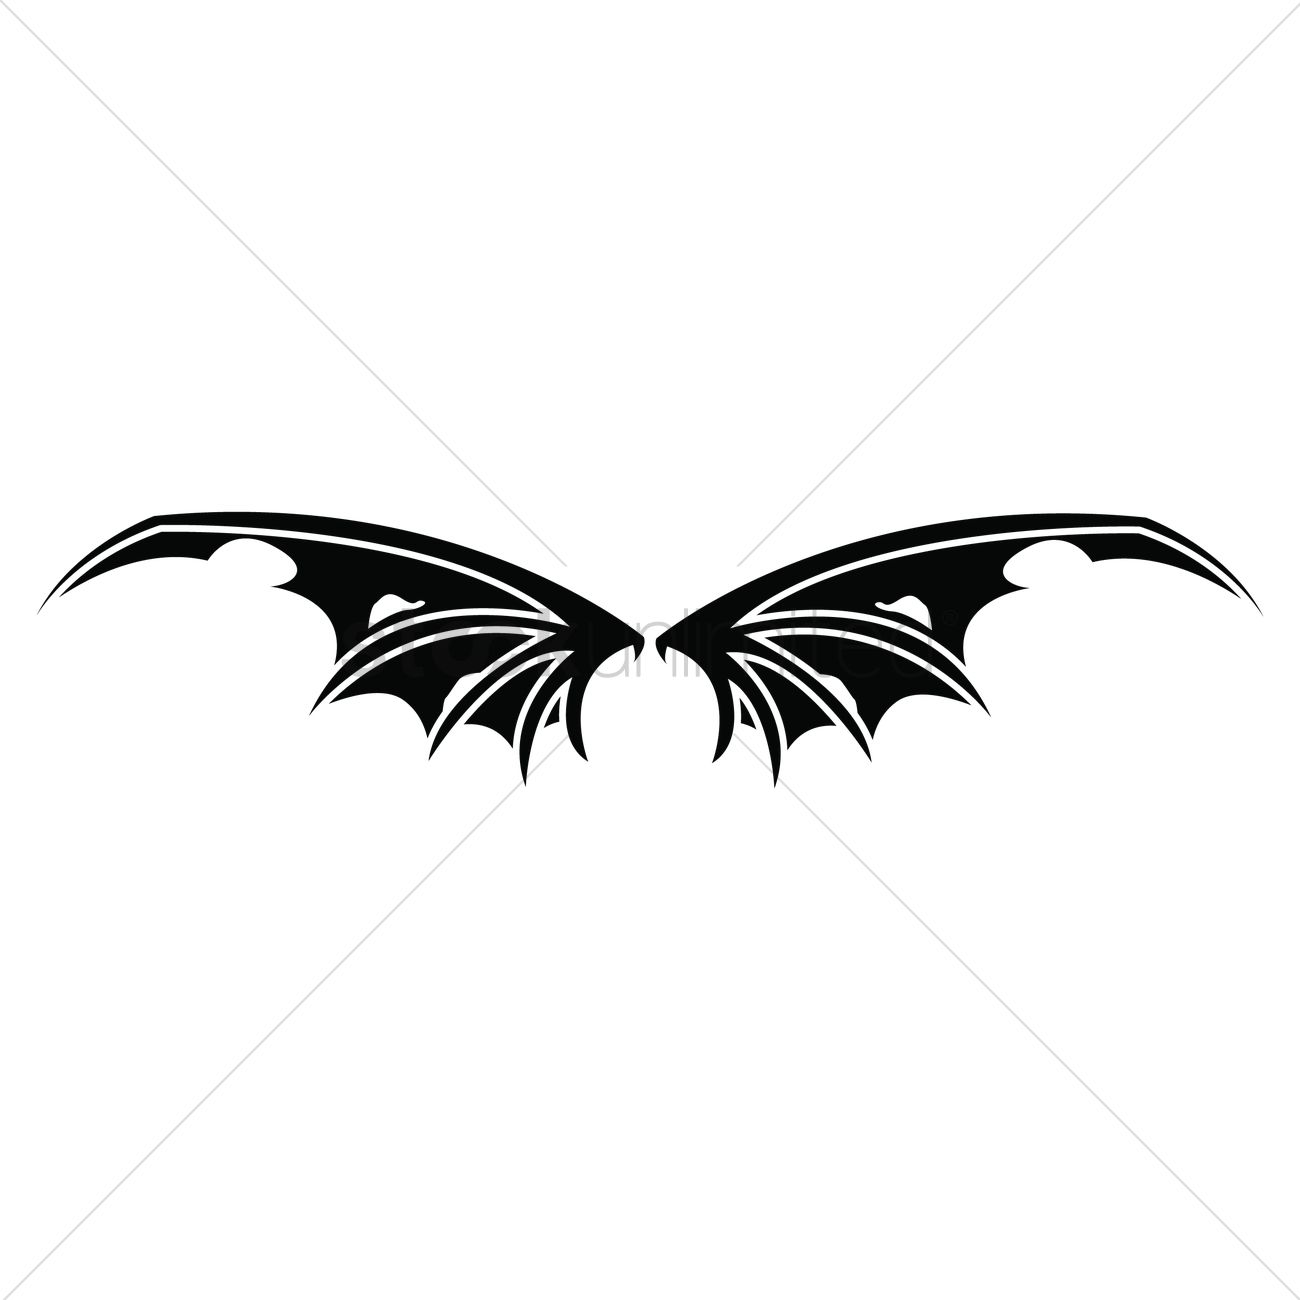 bat wings vector image 1525413 stockunlimited rh stockunlimited com